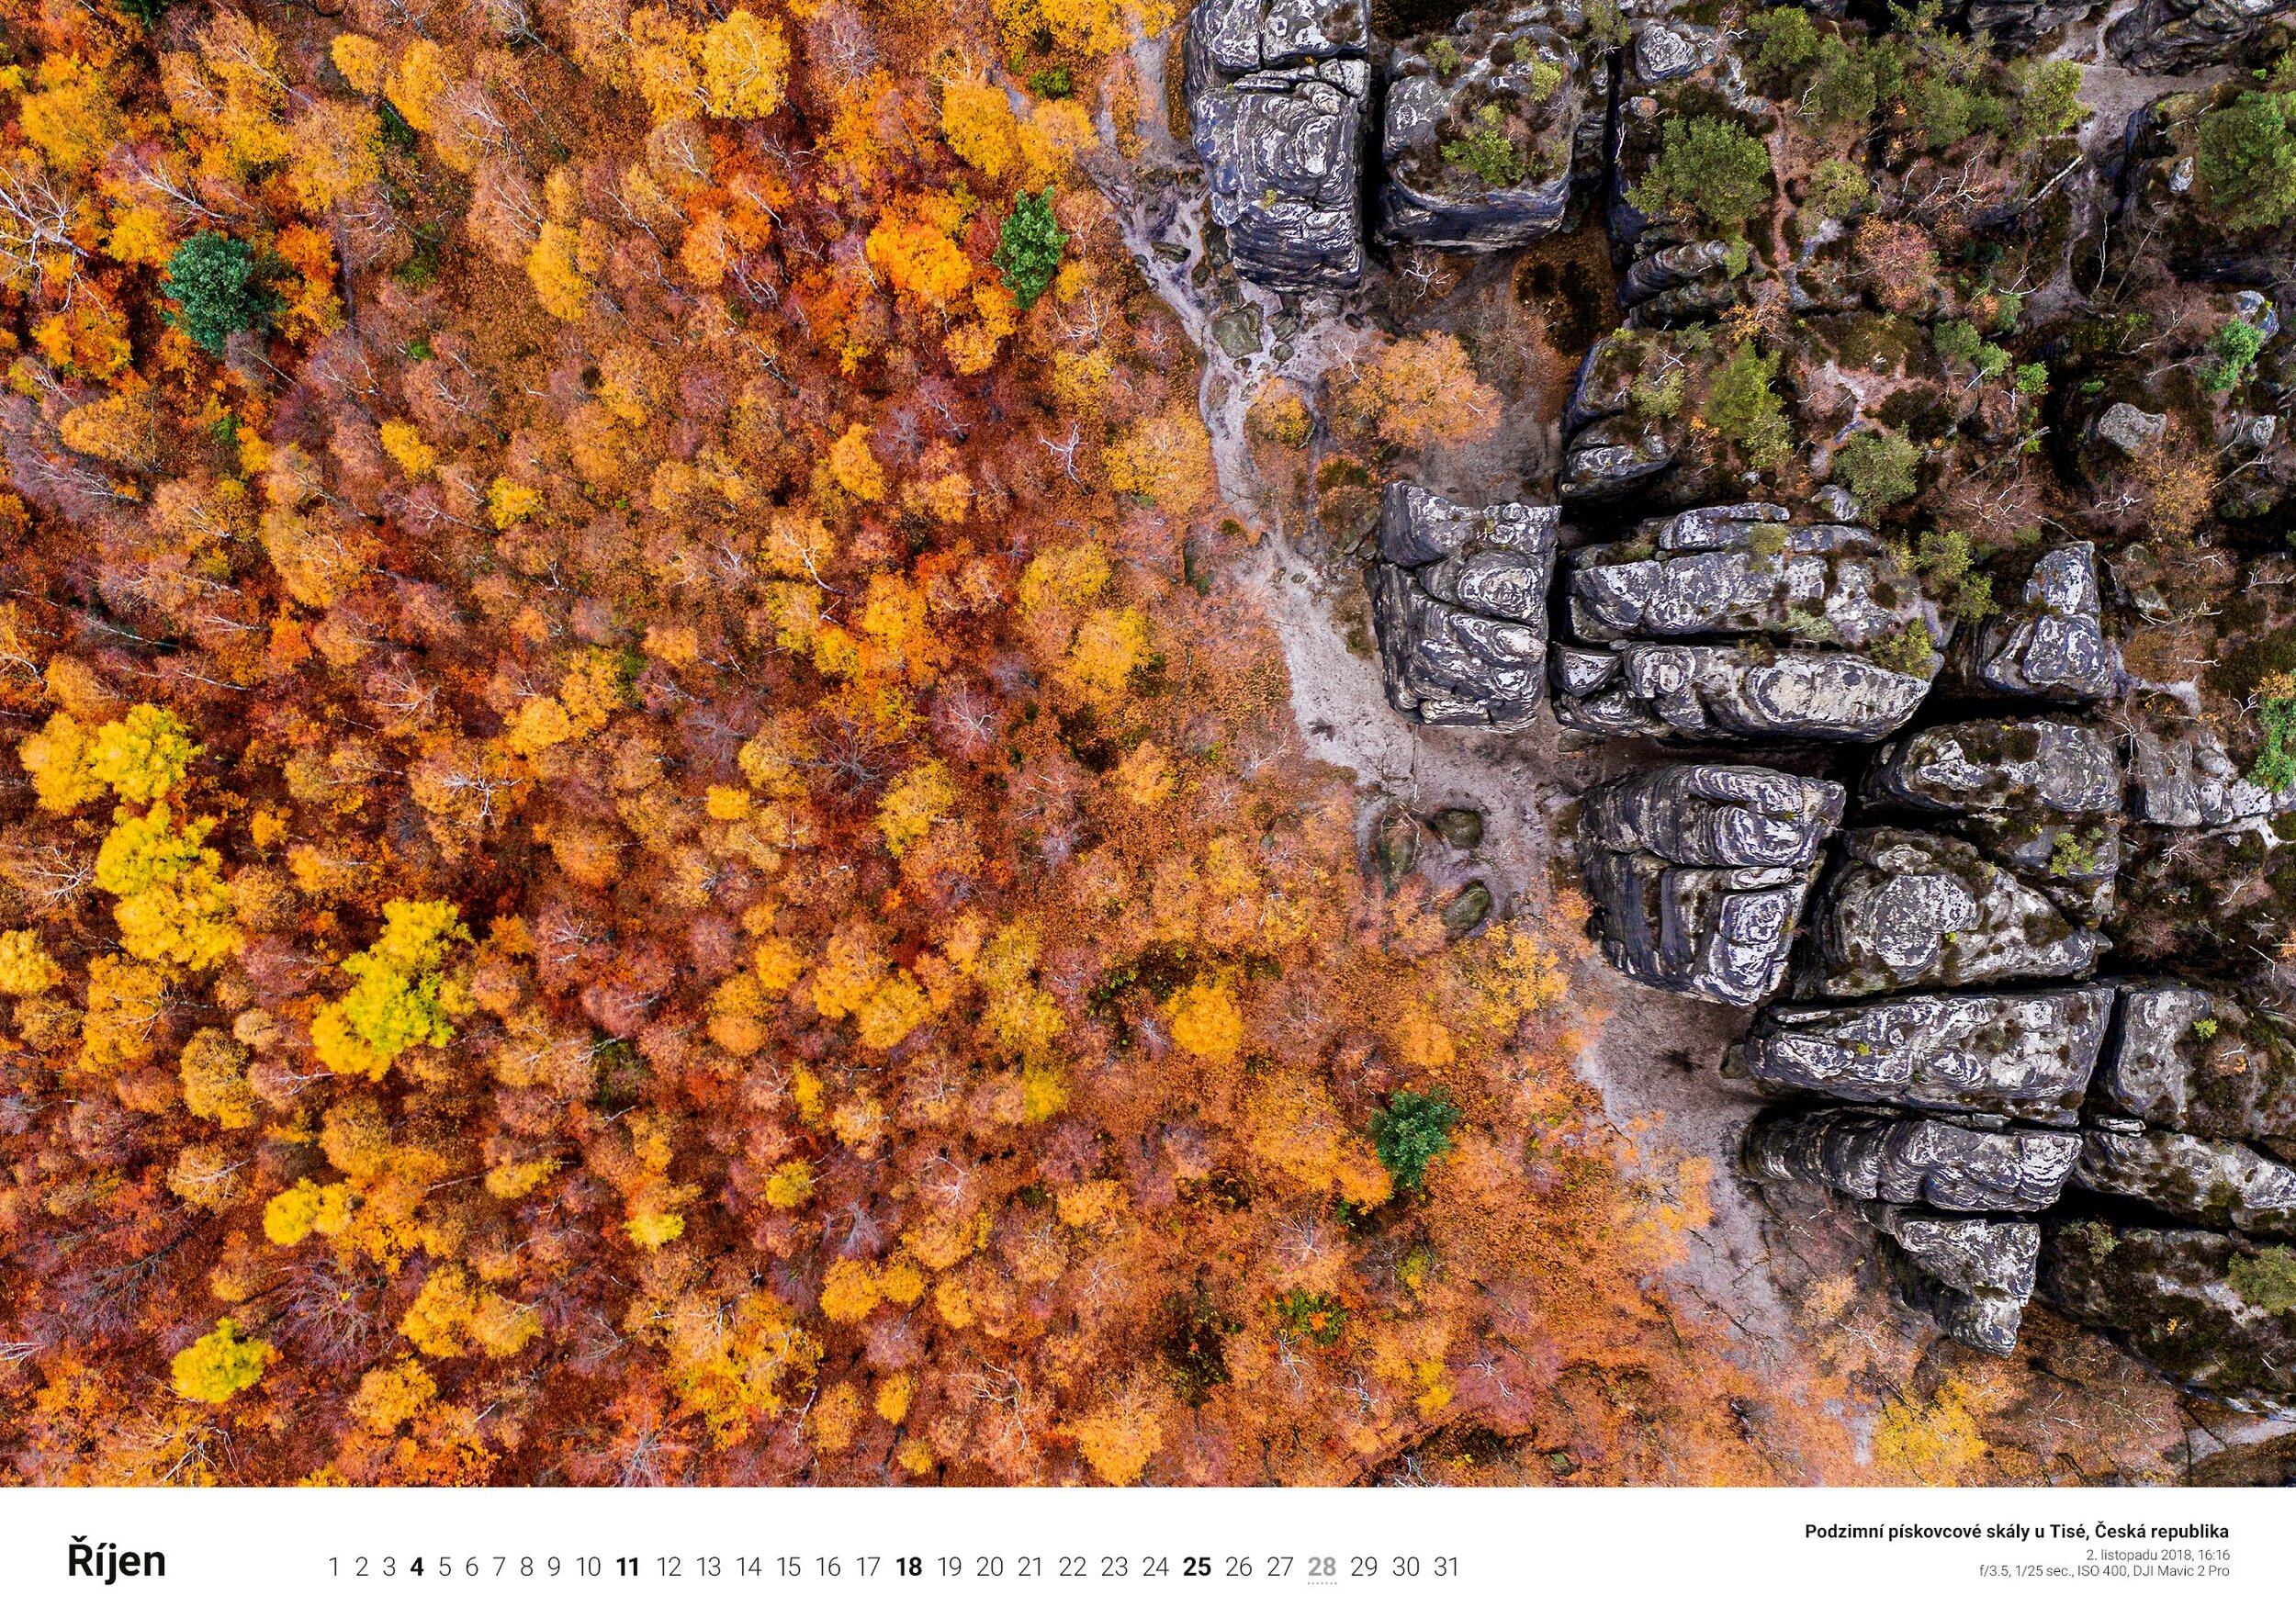 juracka_kalendar-2019_440x310mm_10.jpg